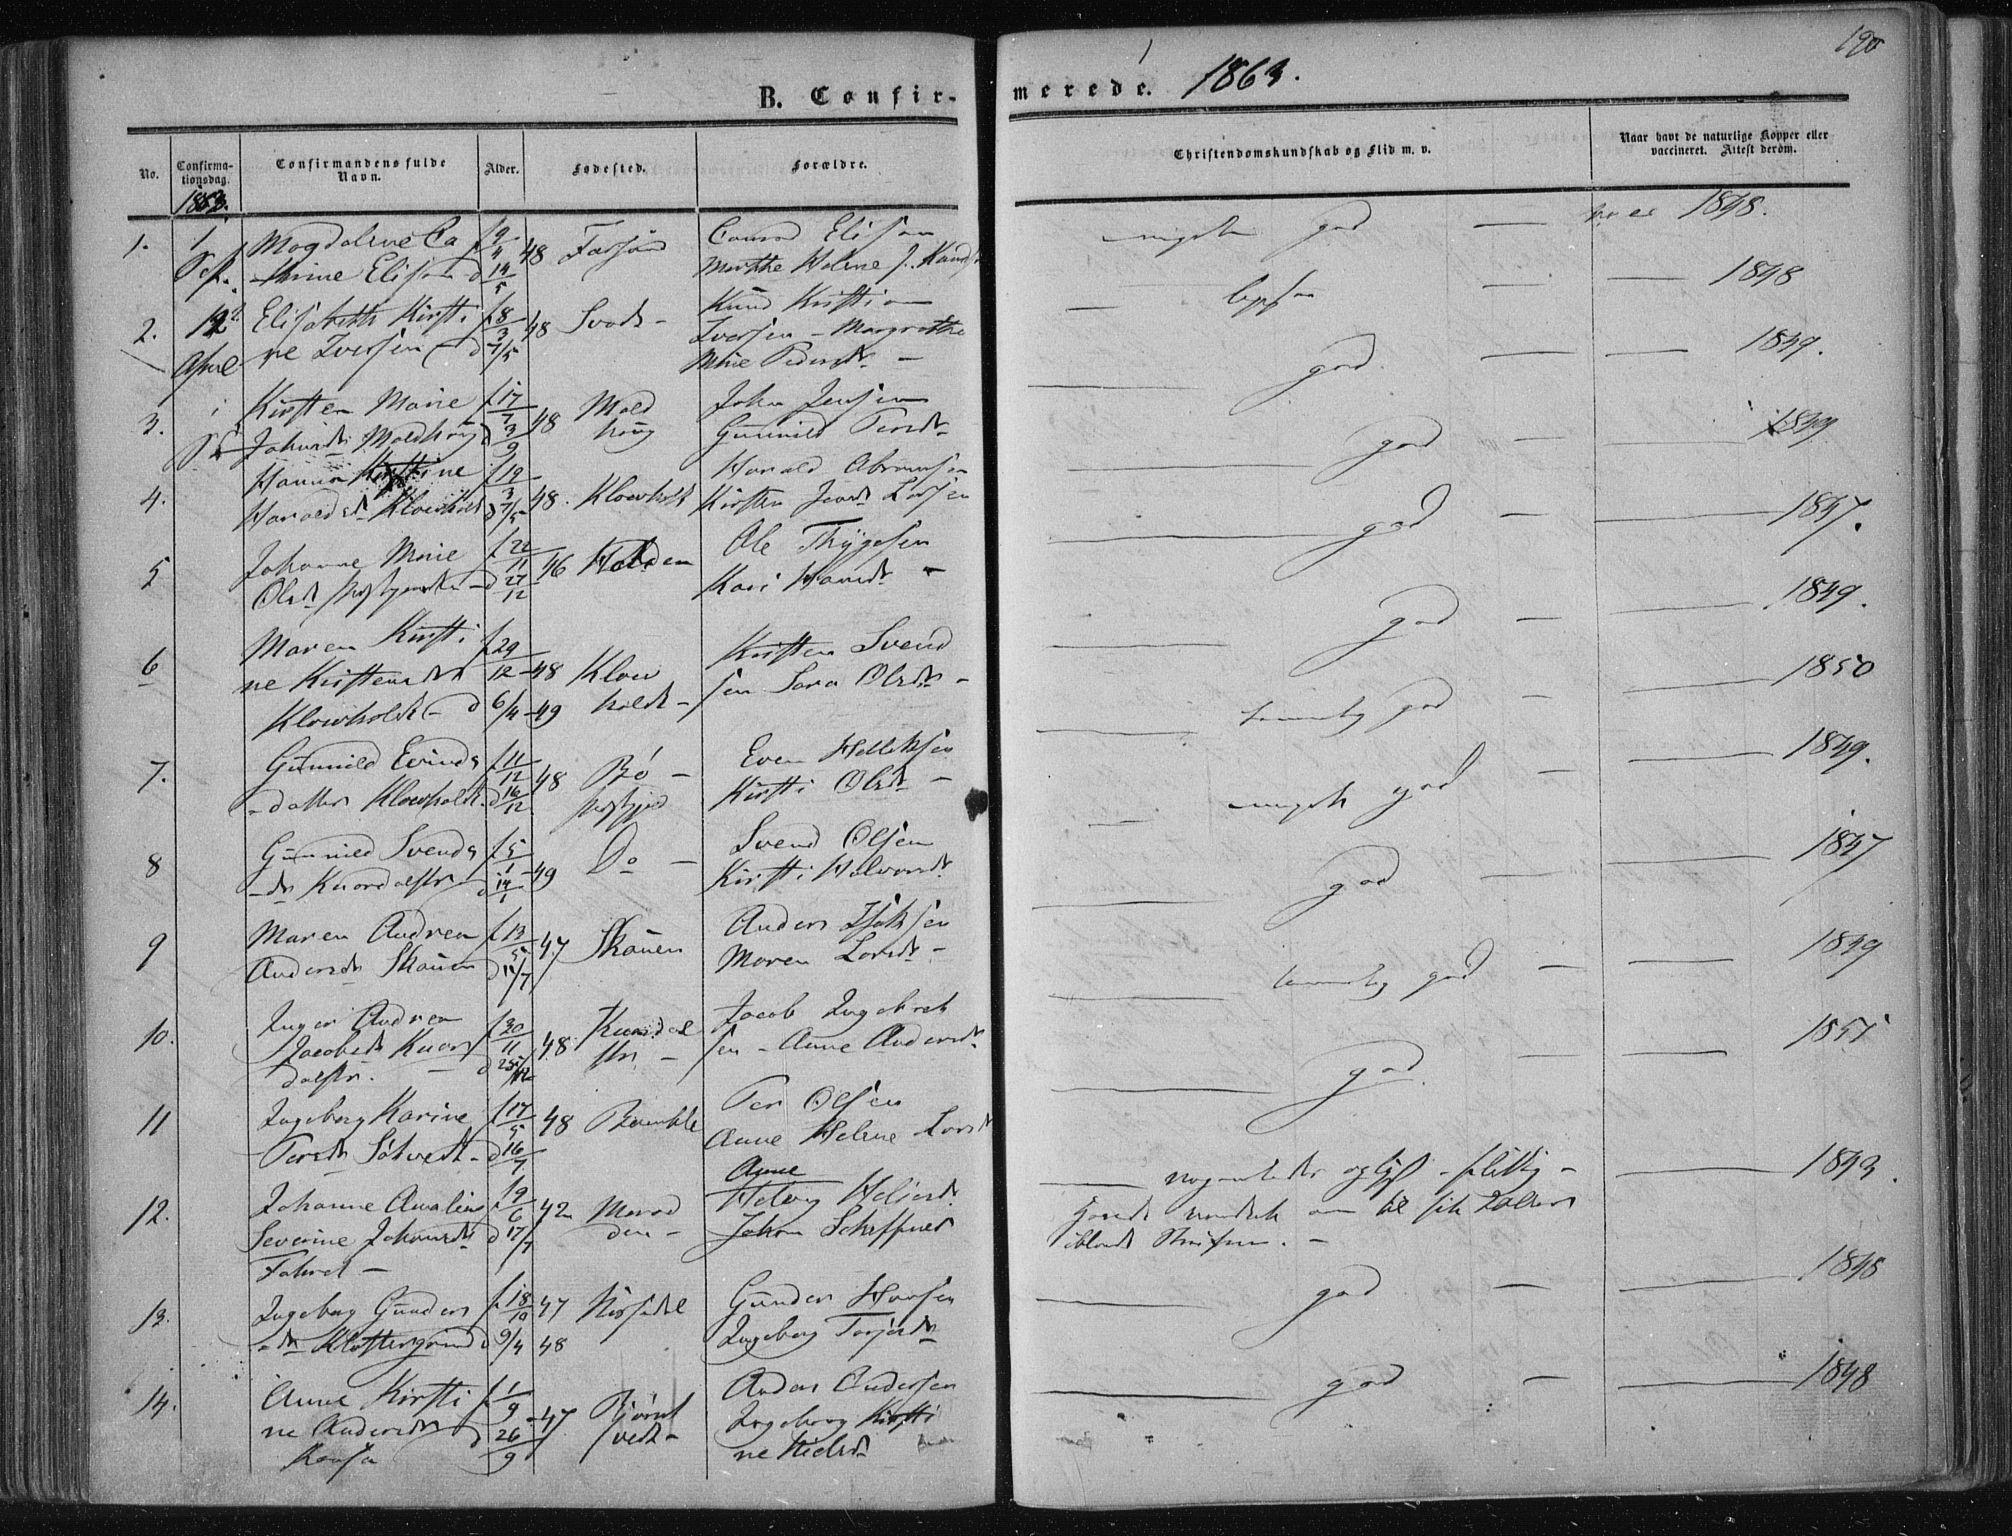 SAKO, Solum kirkebøker, F/Fa/L0007: Ministerialbok nr. I 7, 1856-1864, s. 190